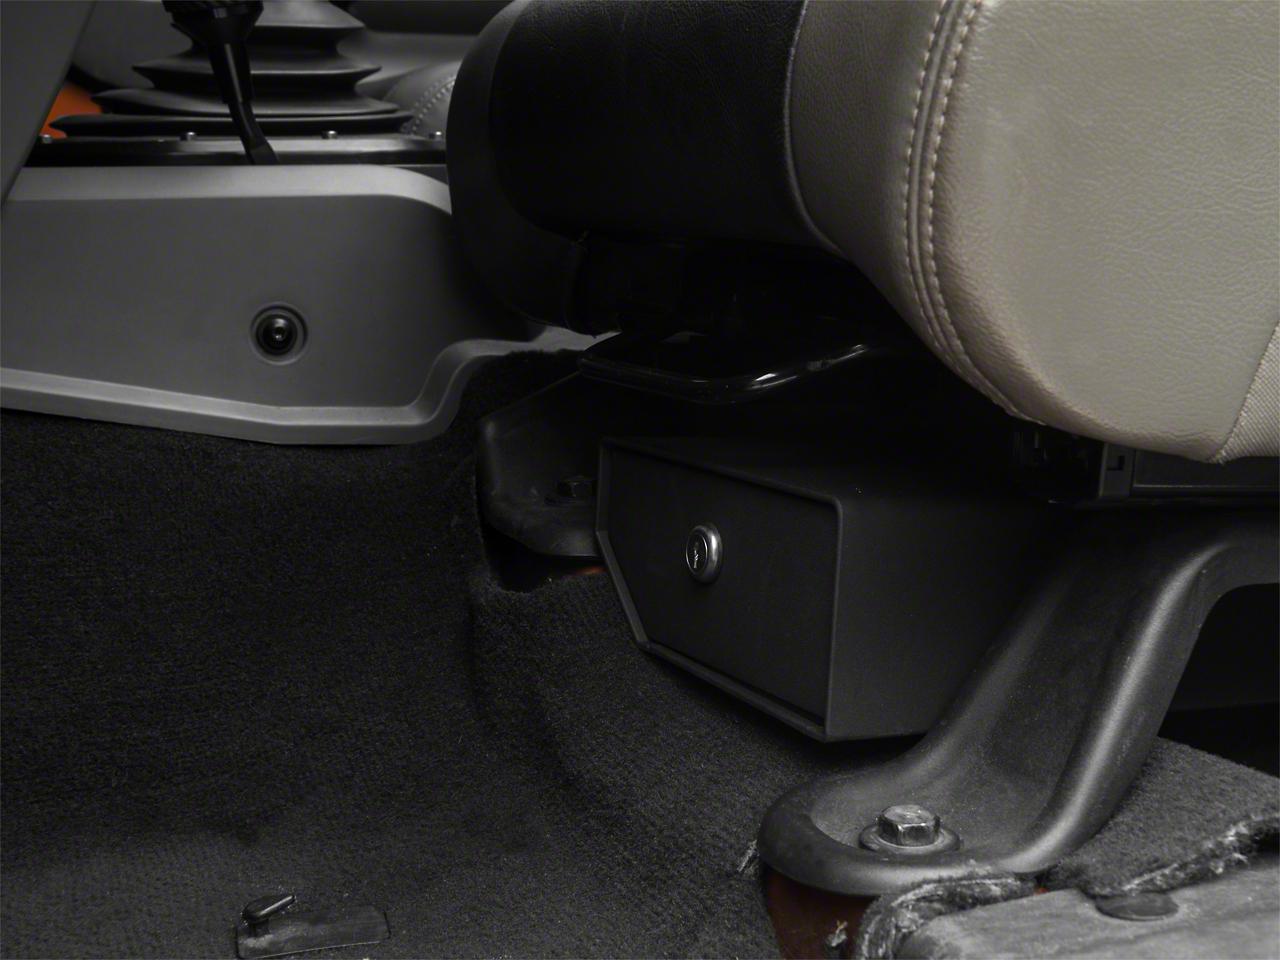 Bestop Underseat Storage Lock Box - Driver Side (07-10 Jeep Wrangler JK 2 Door; 07-18 Jeep Wrangler JK 4 Door)